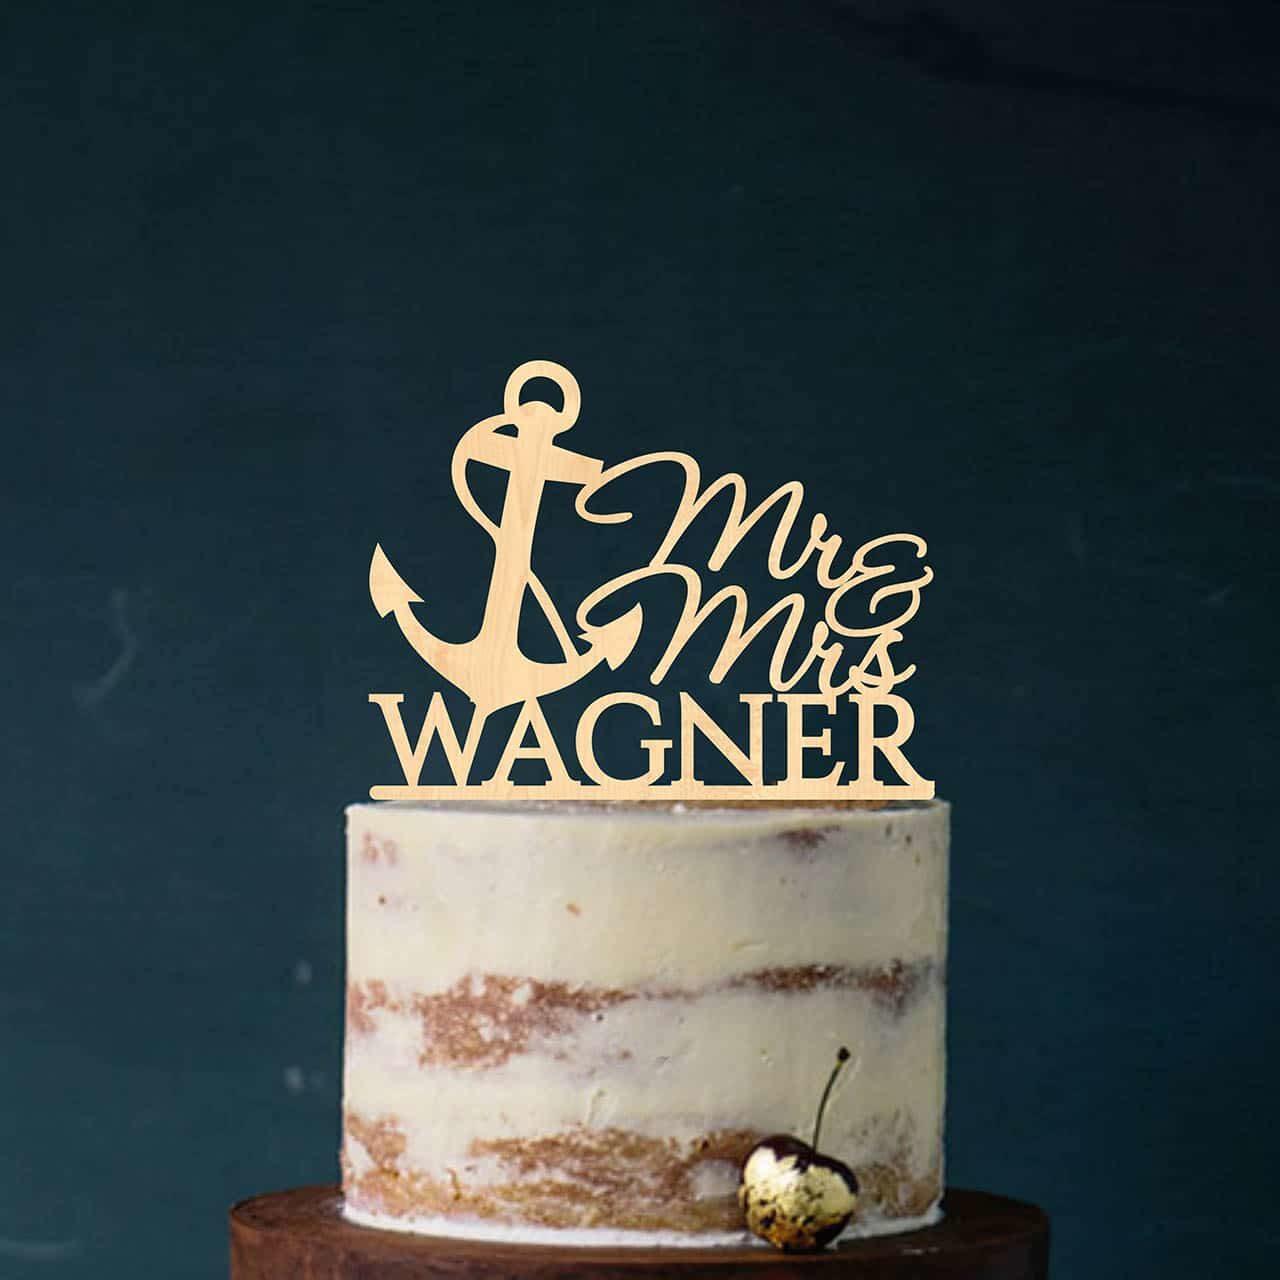 MrMrs Wagner_2018